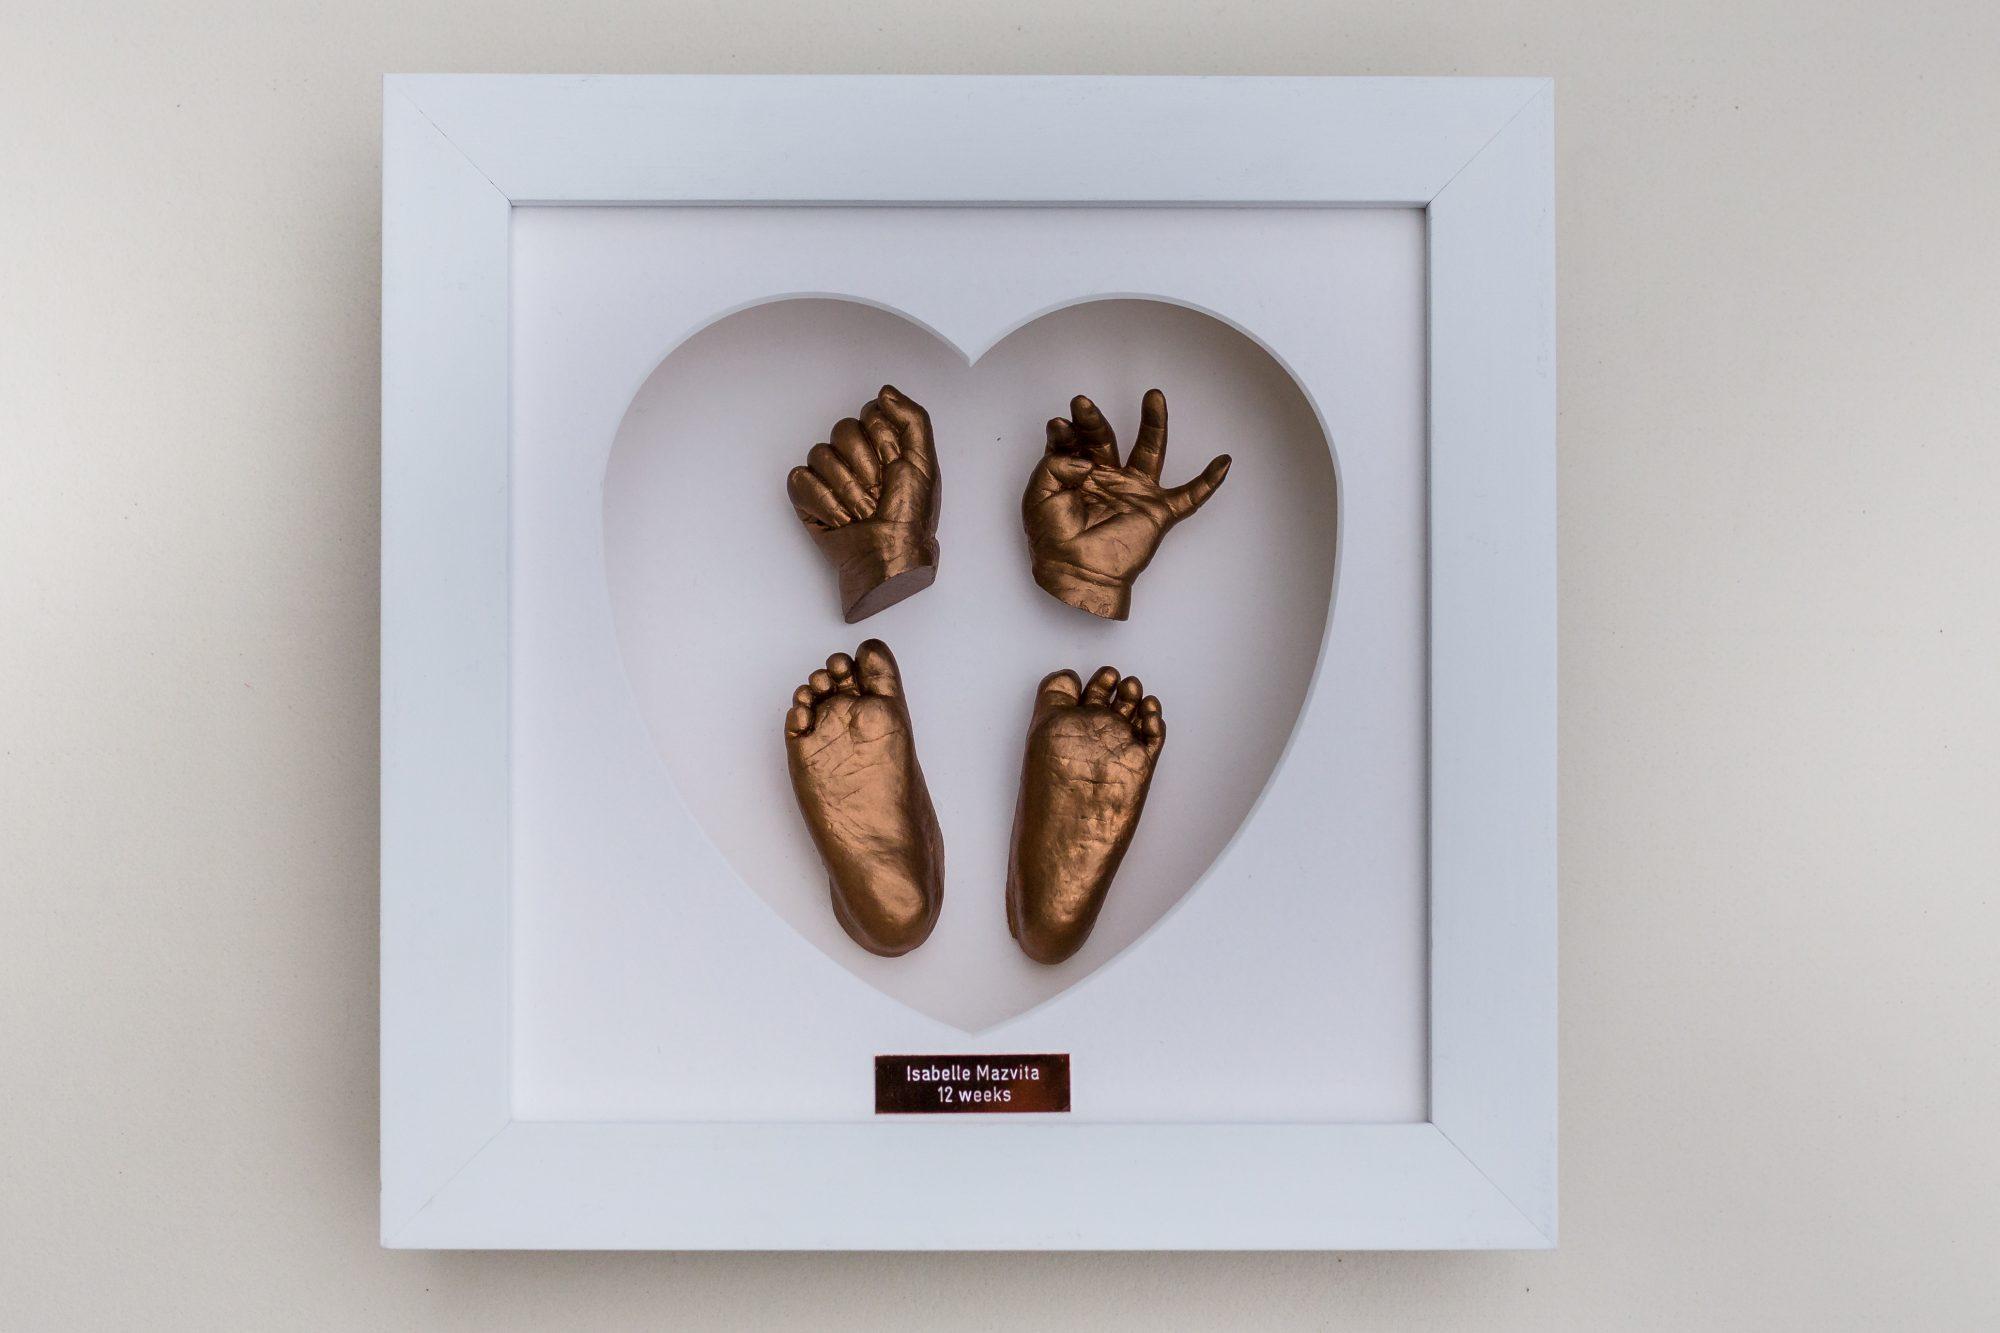 Casting Love bronze casts